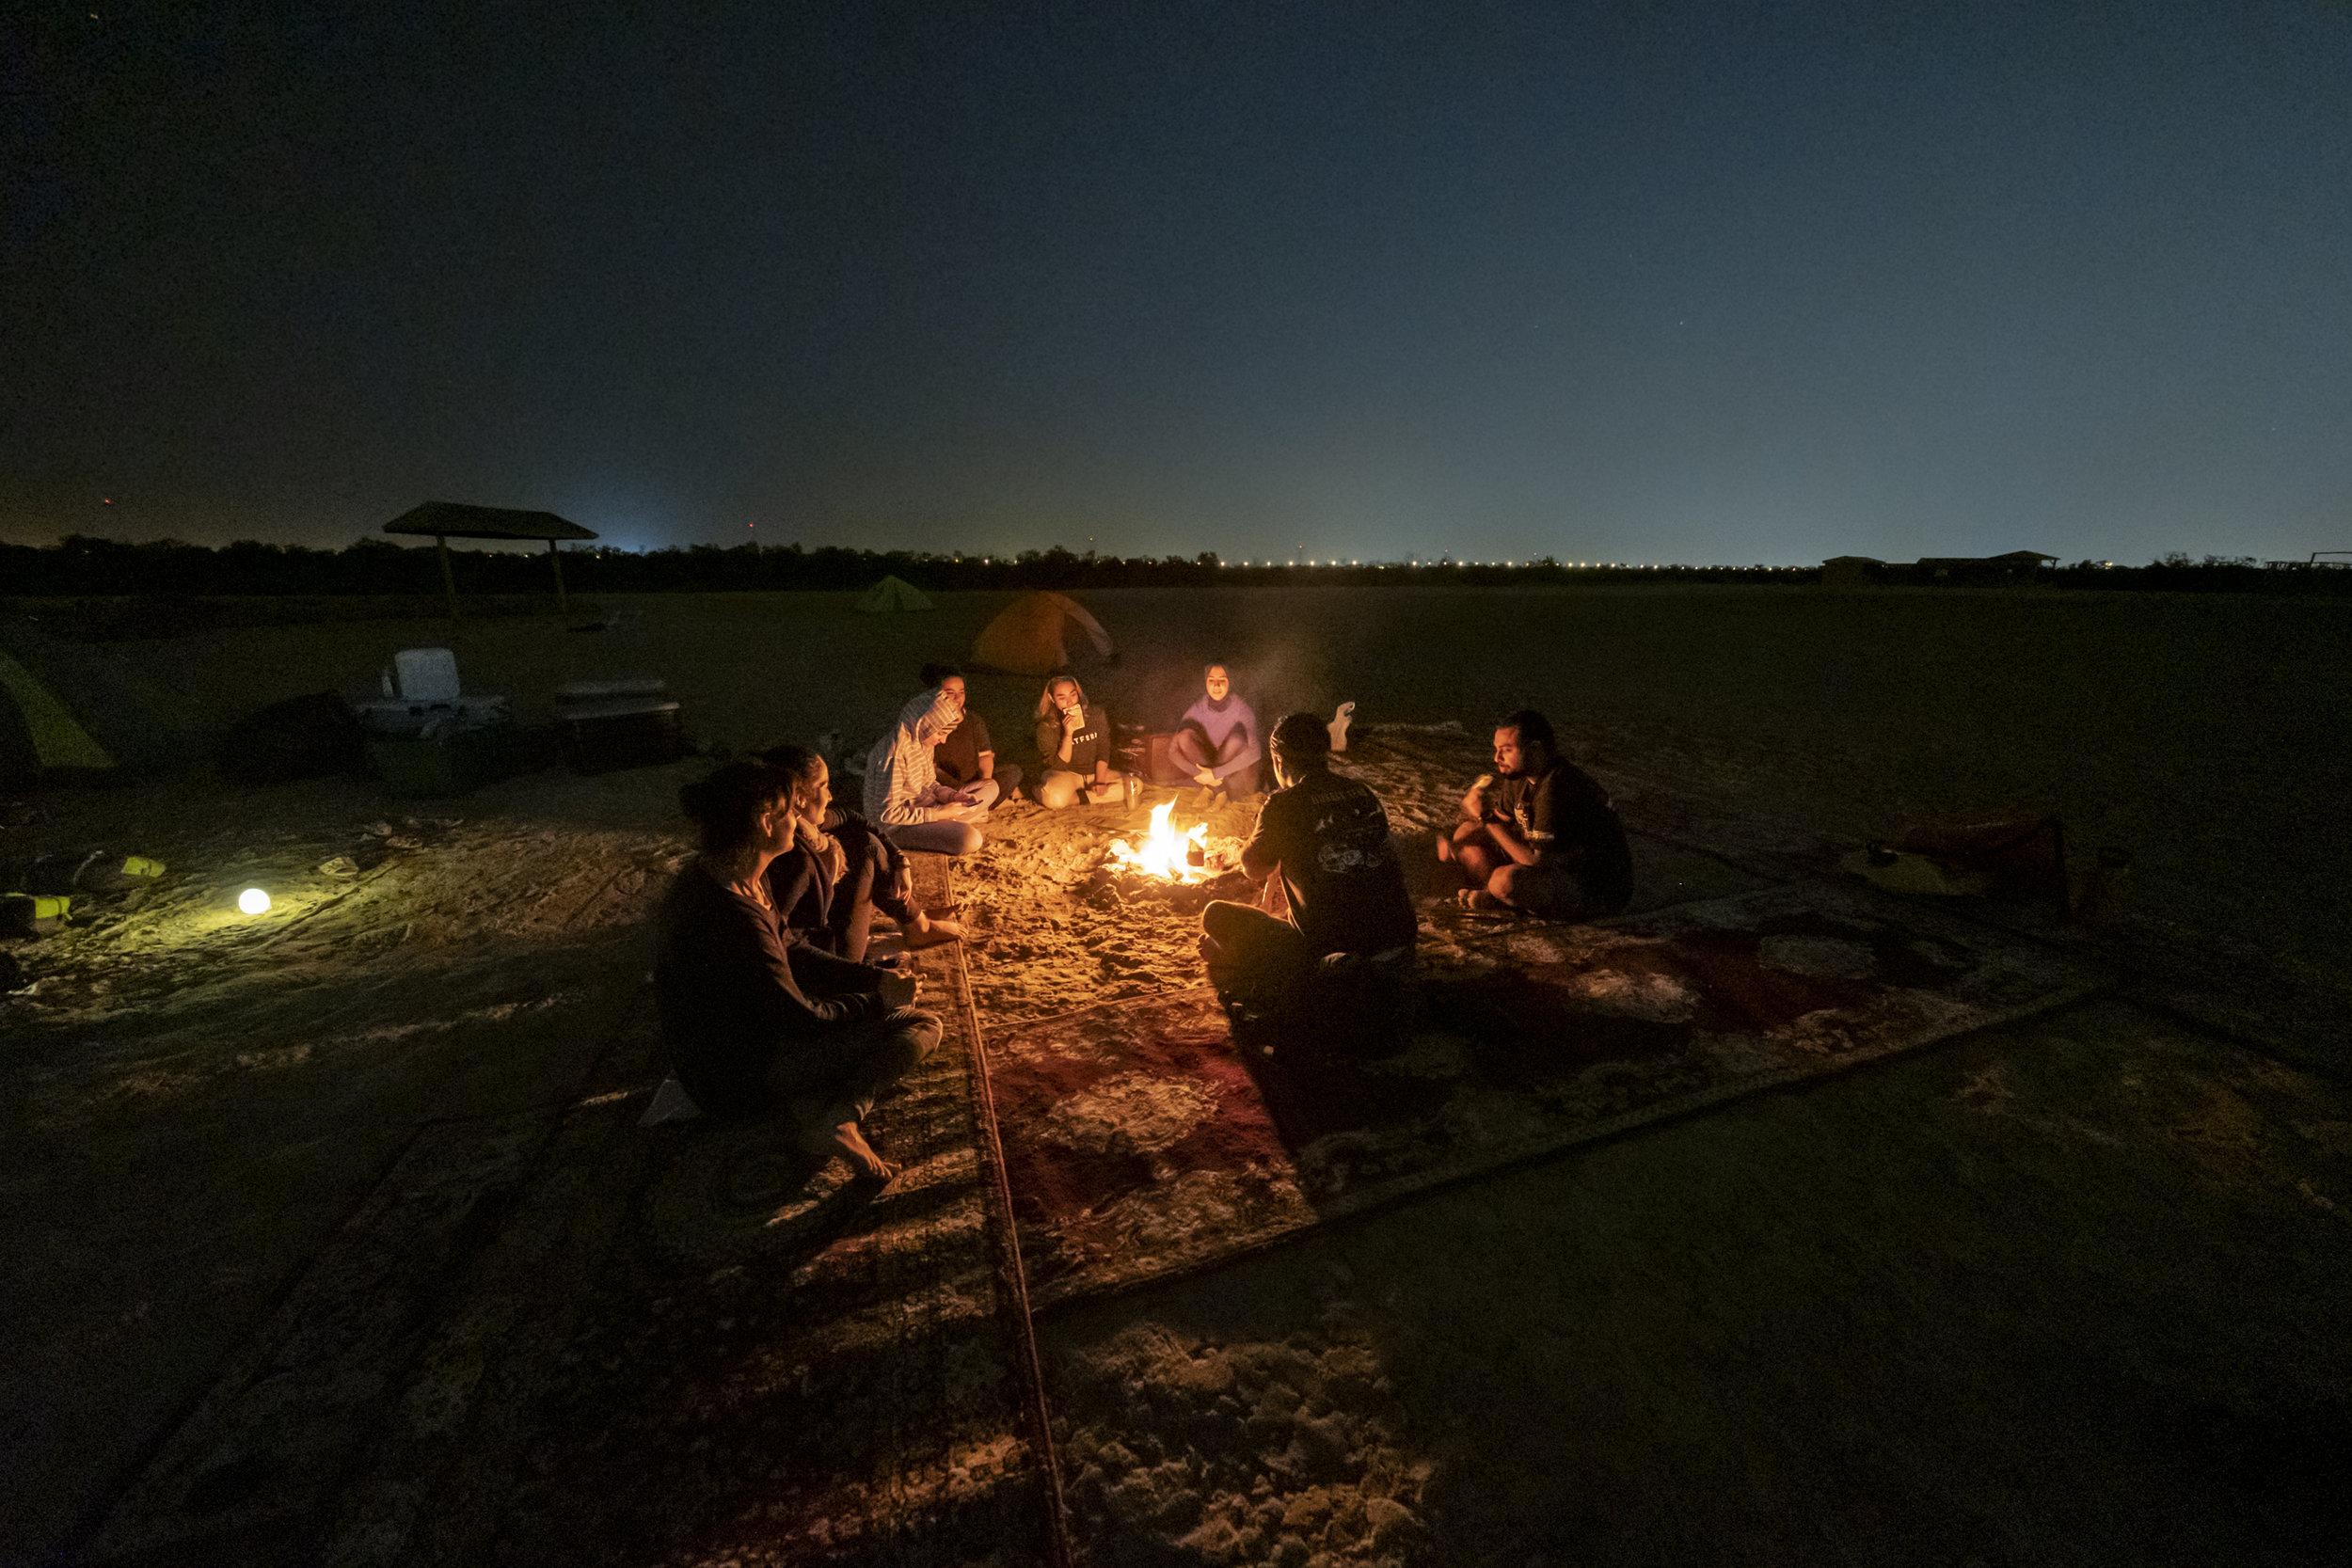 Sat around campfire on mangrove island_Abu Dhabi_(c)Oliver Wheeldon.jpg